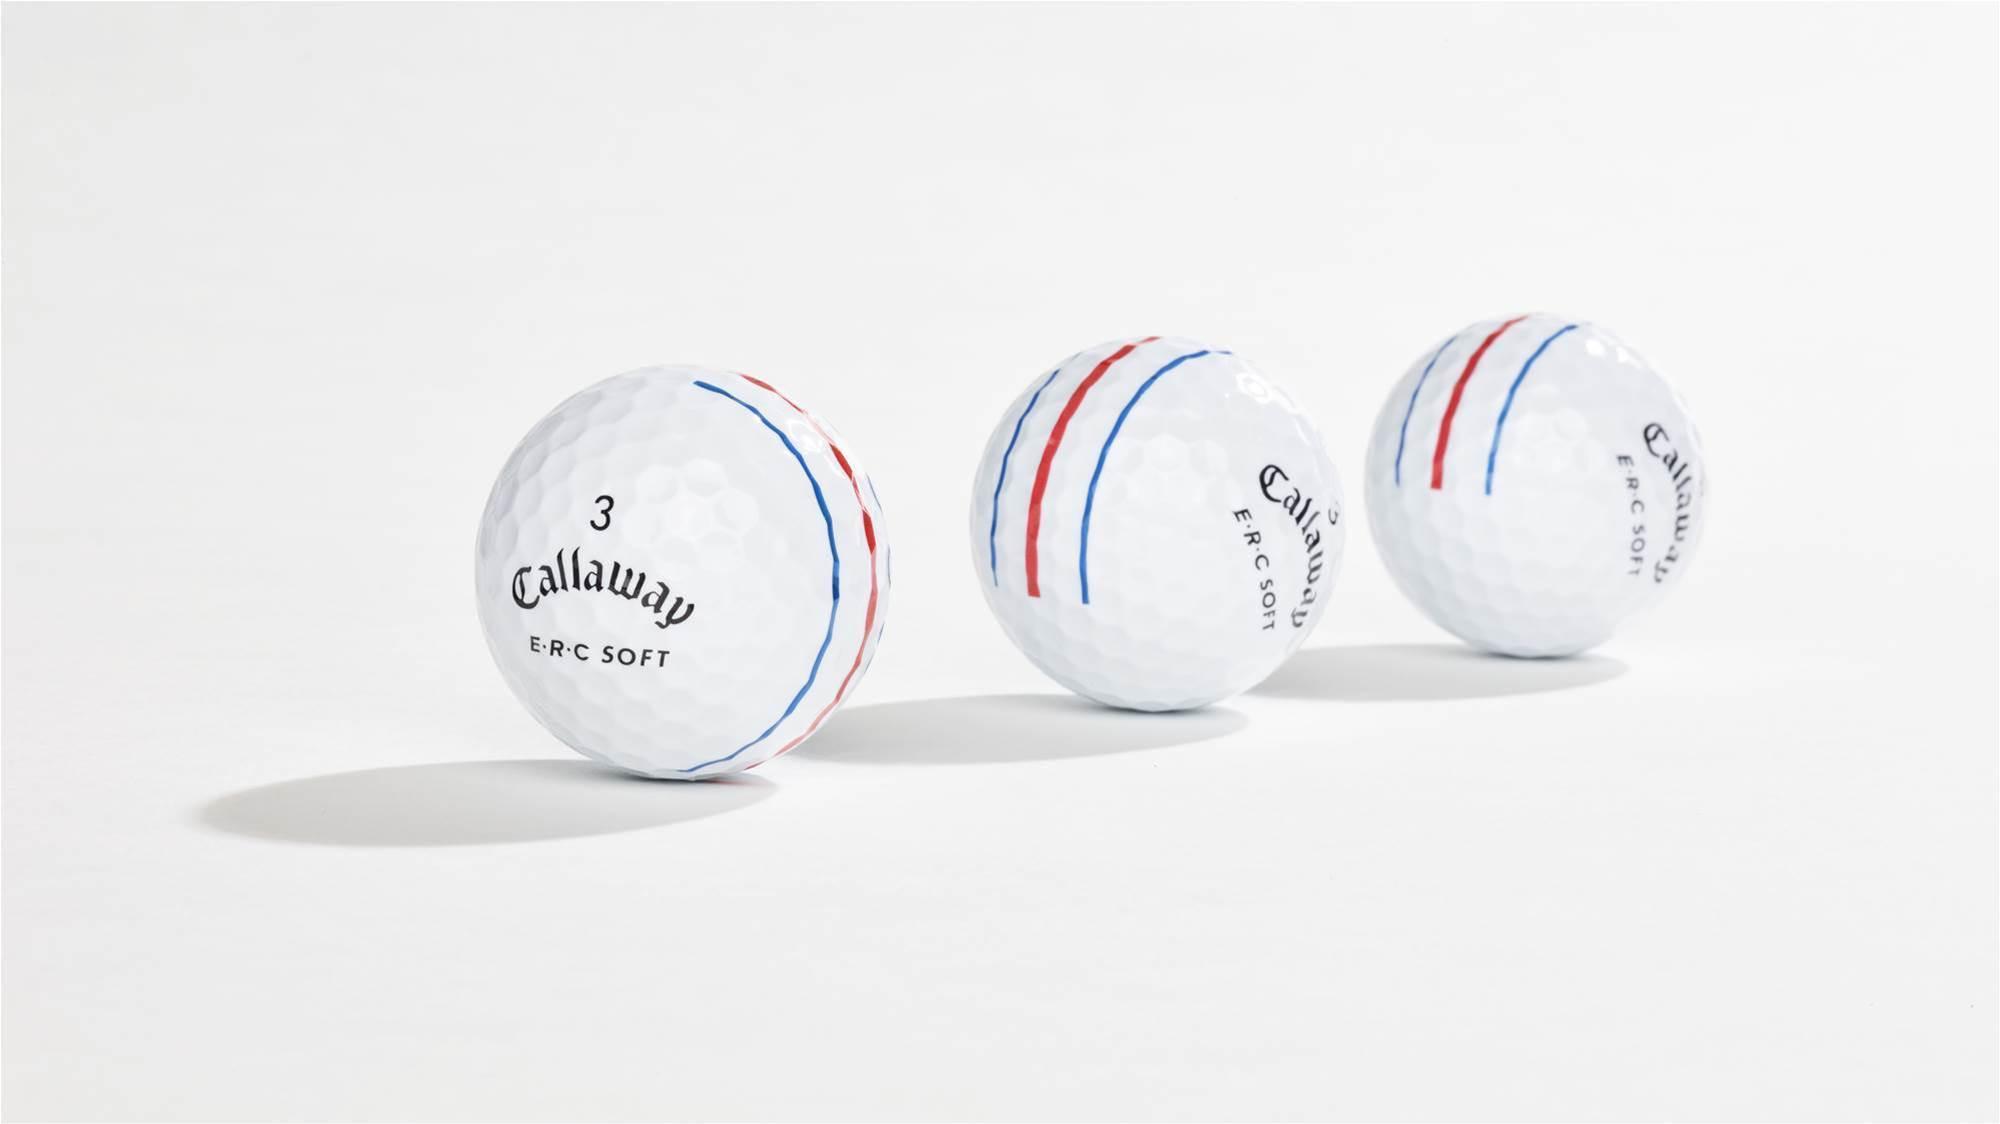 Callaway expand golf ball offering